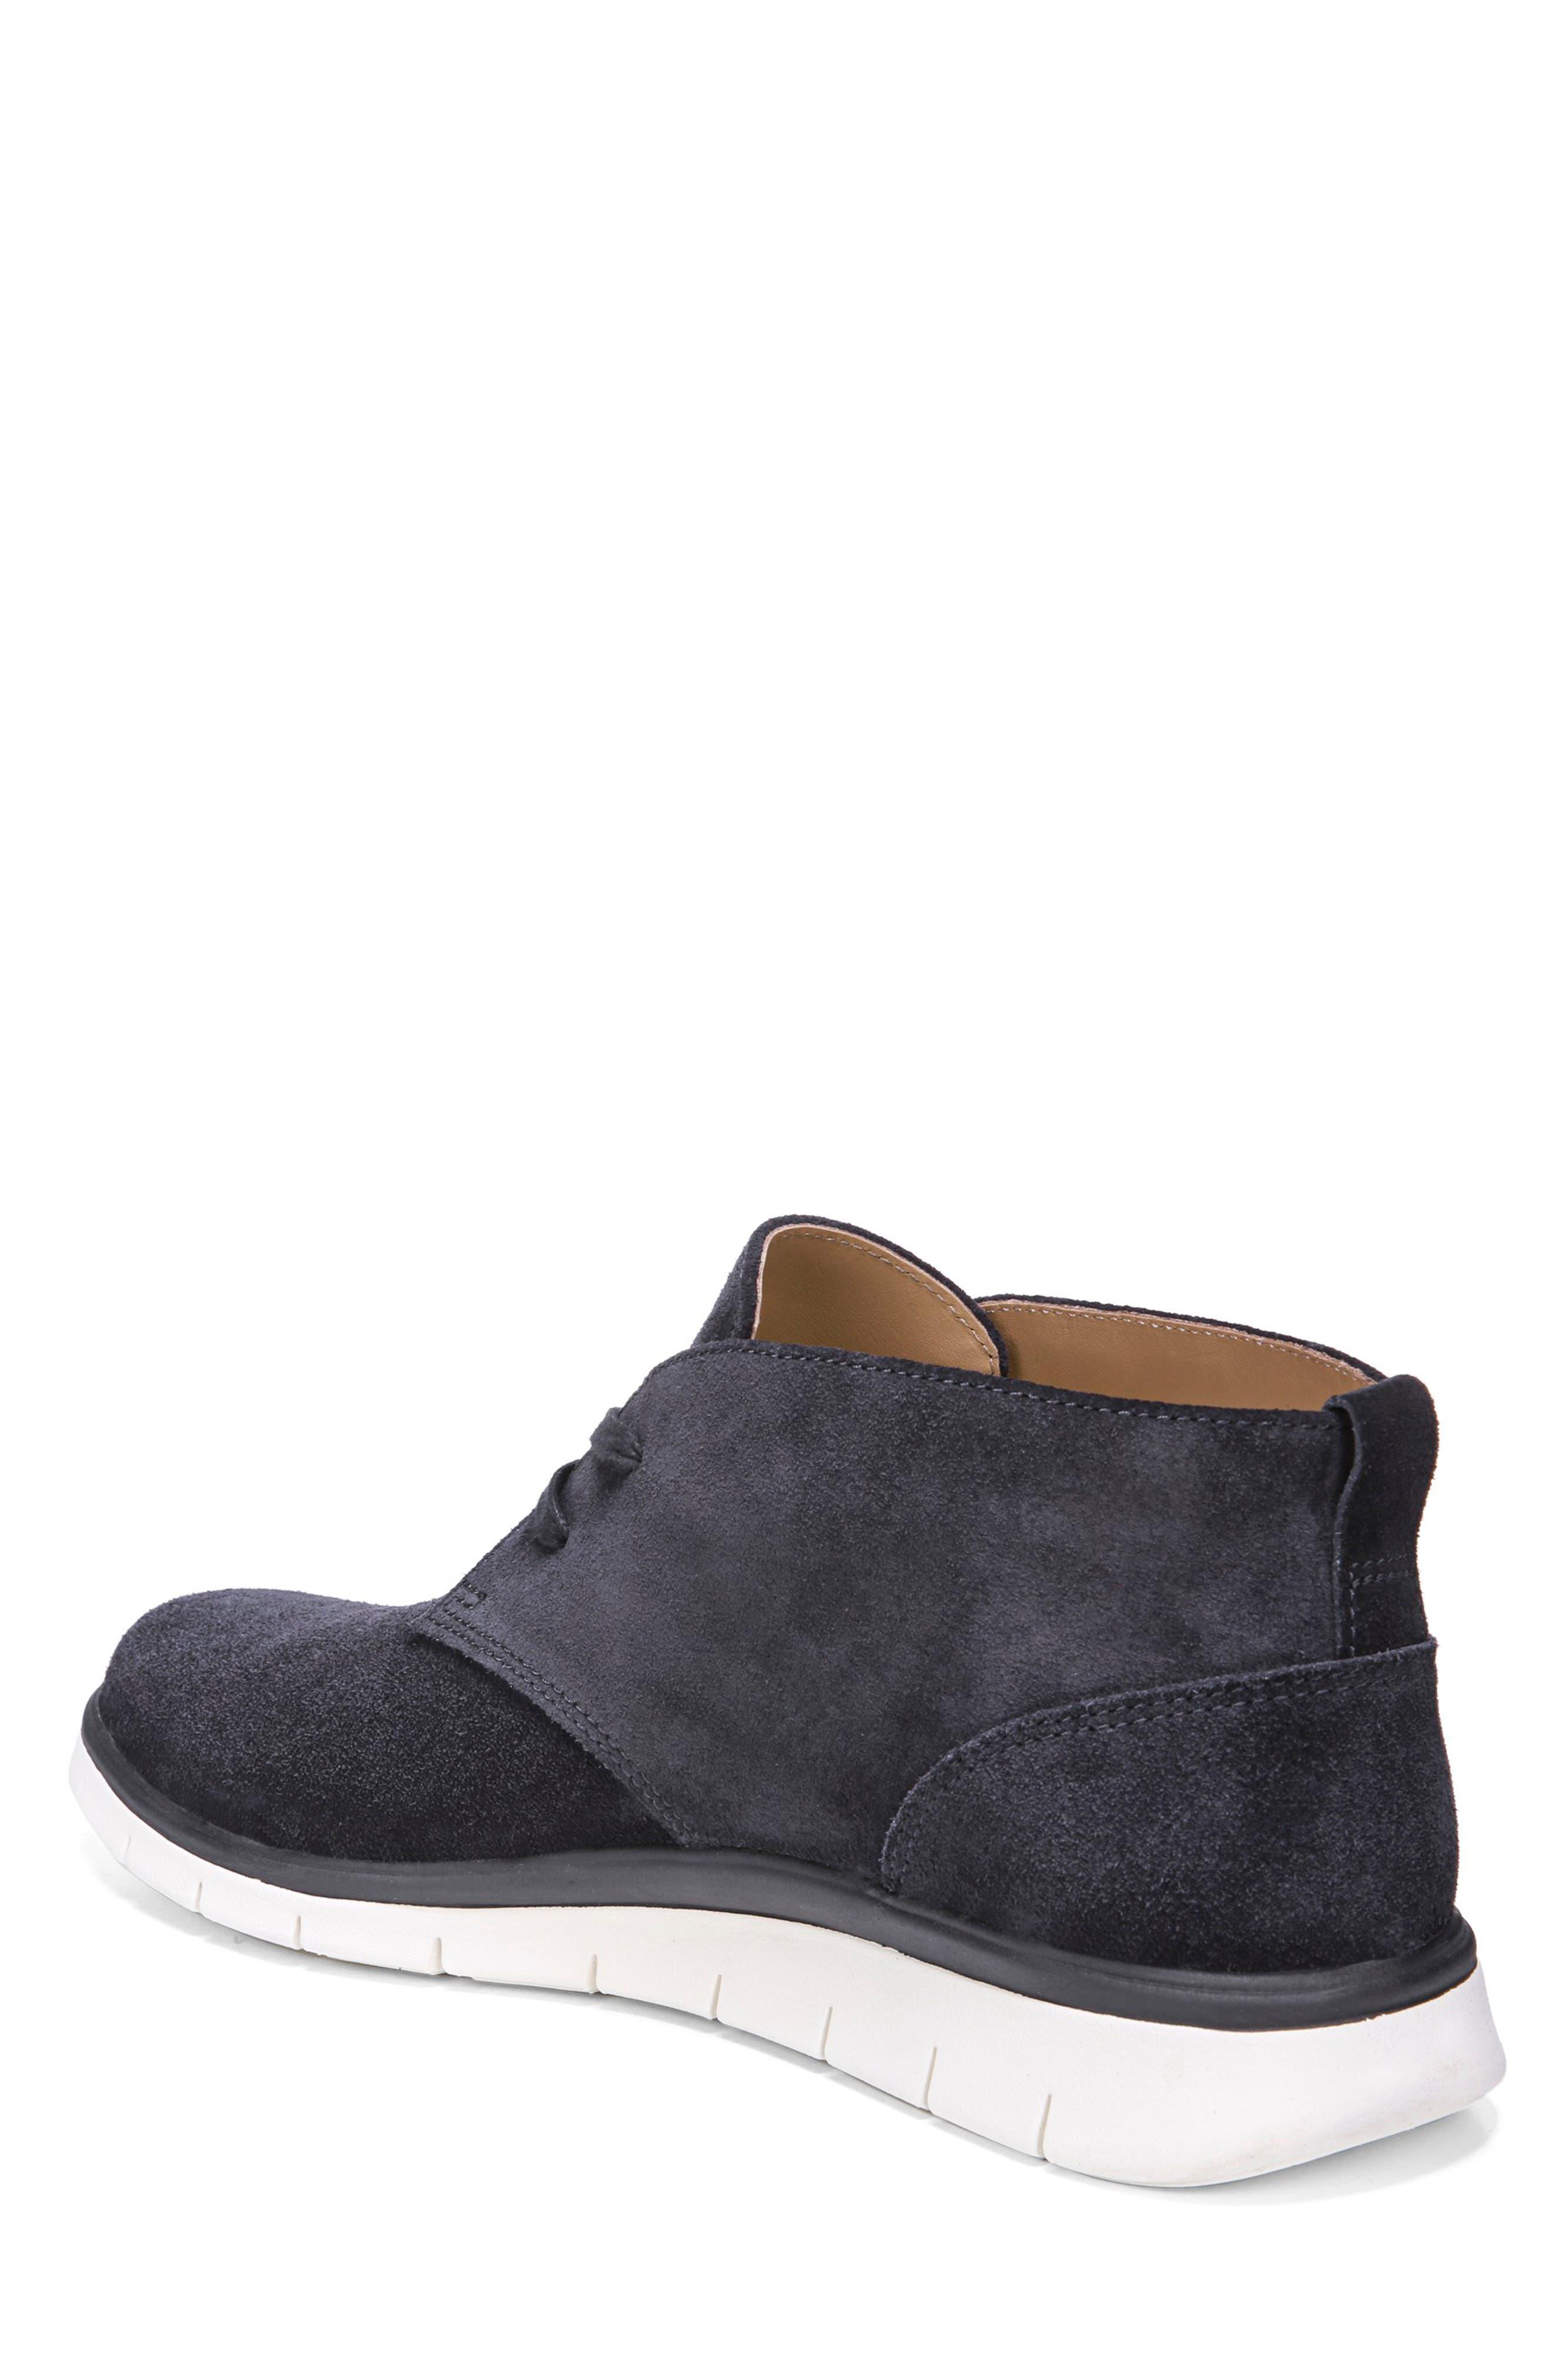 Vince Stapleton Leather Chukka Boot